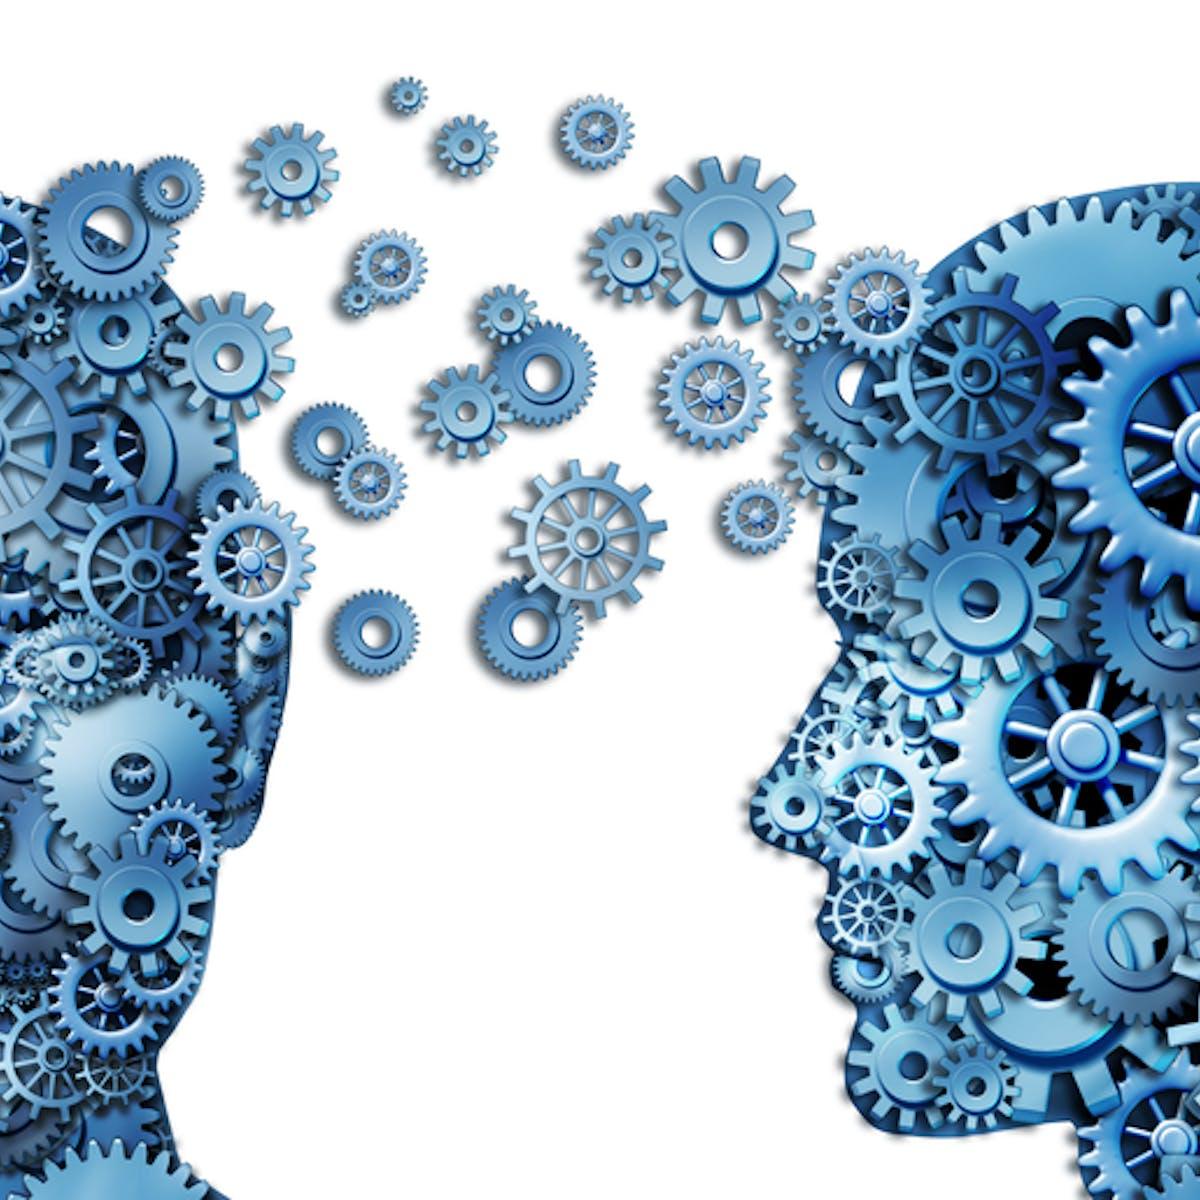 Weird neuroscience: how education hijacked brain research